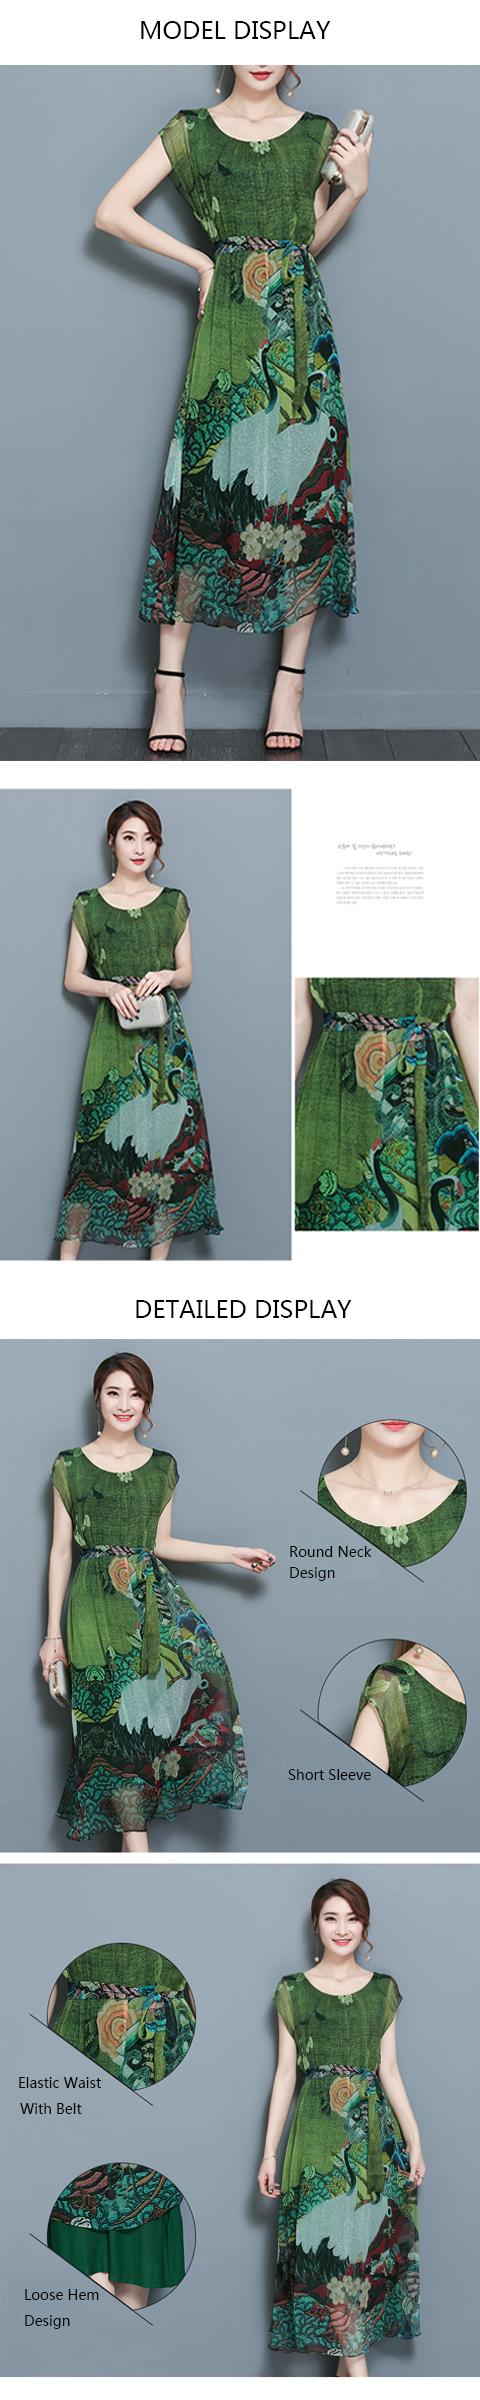 Elegant Women Floral Printed Short Sleeve Mid-long Dress with Belt